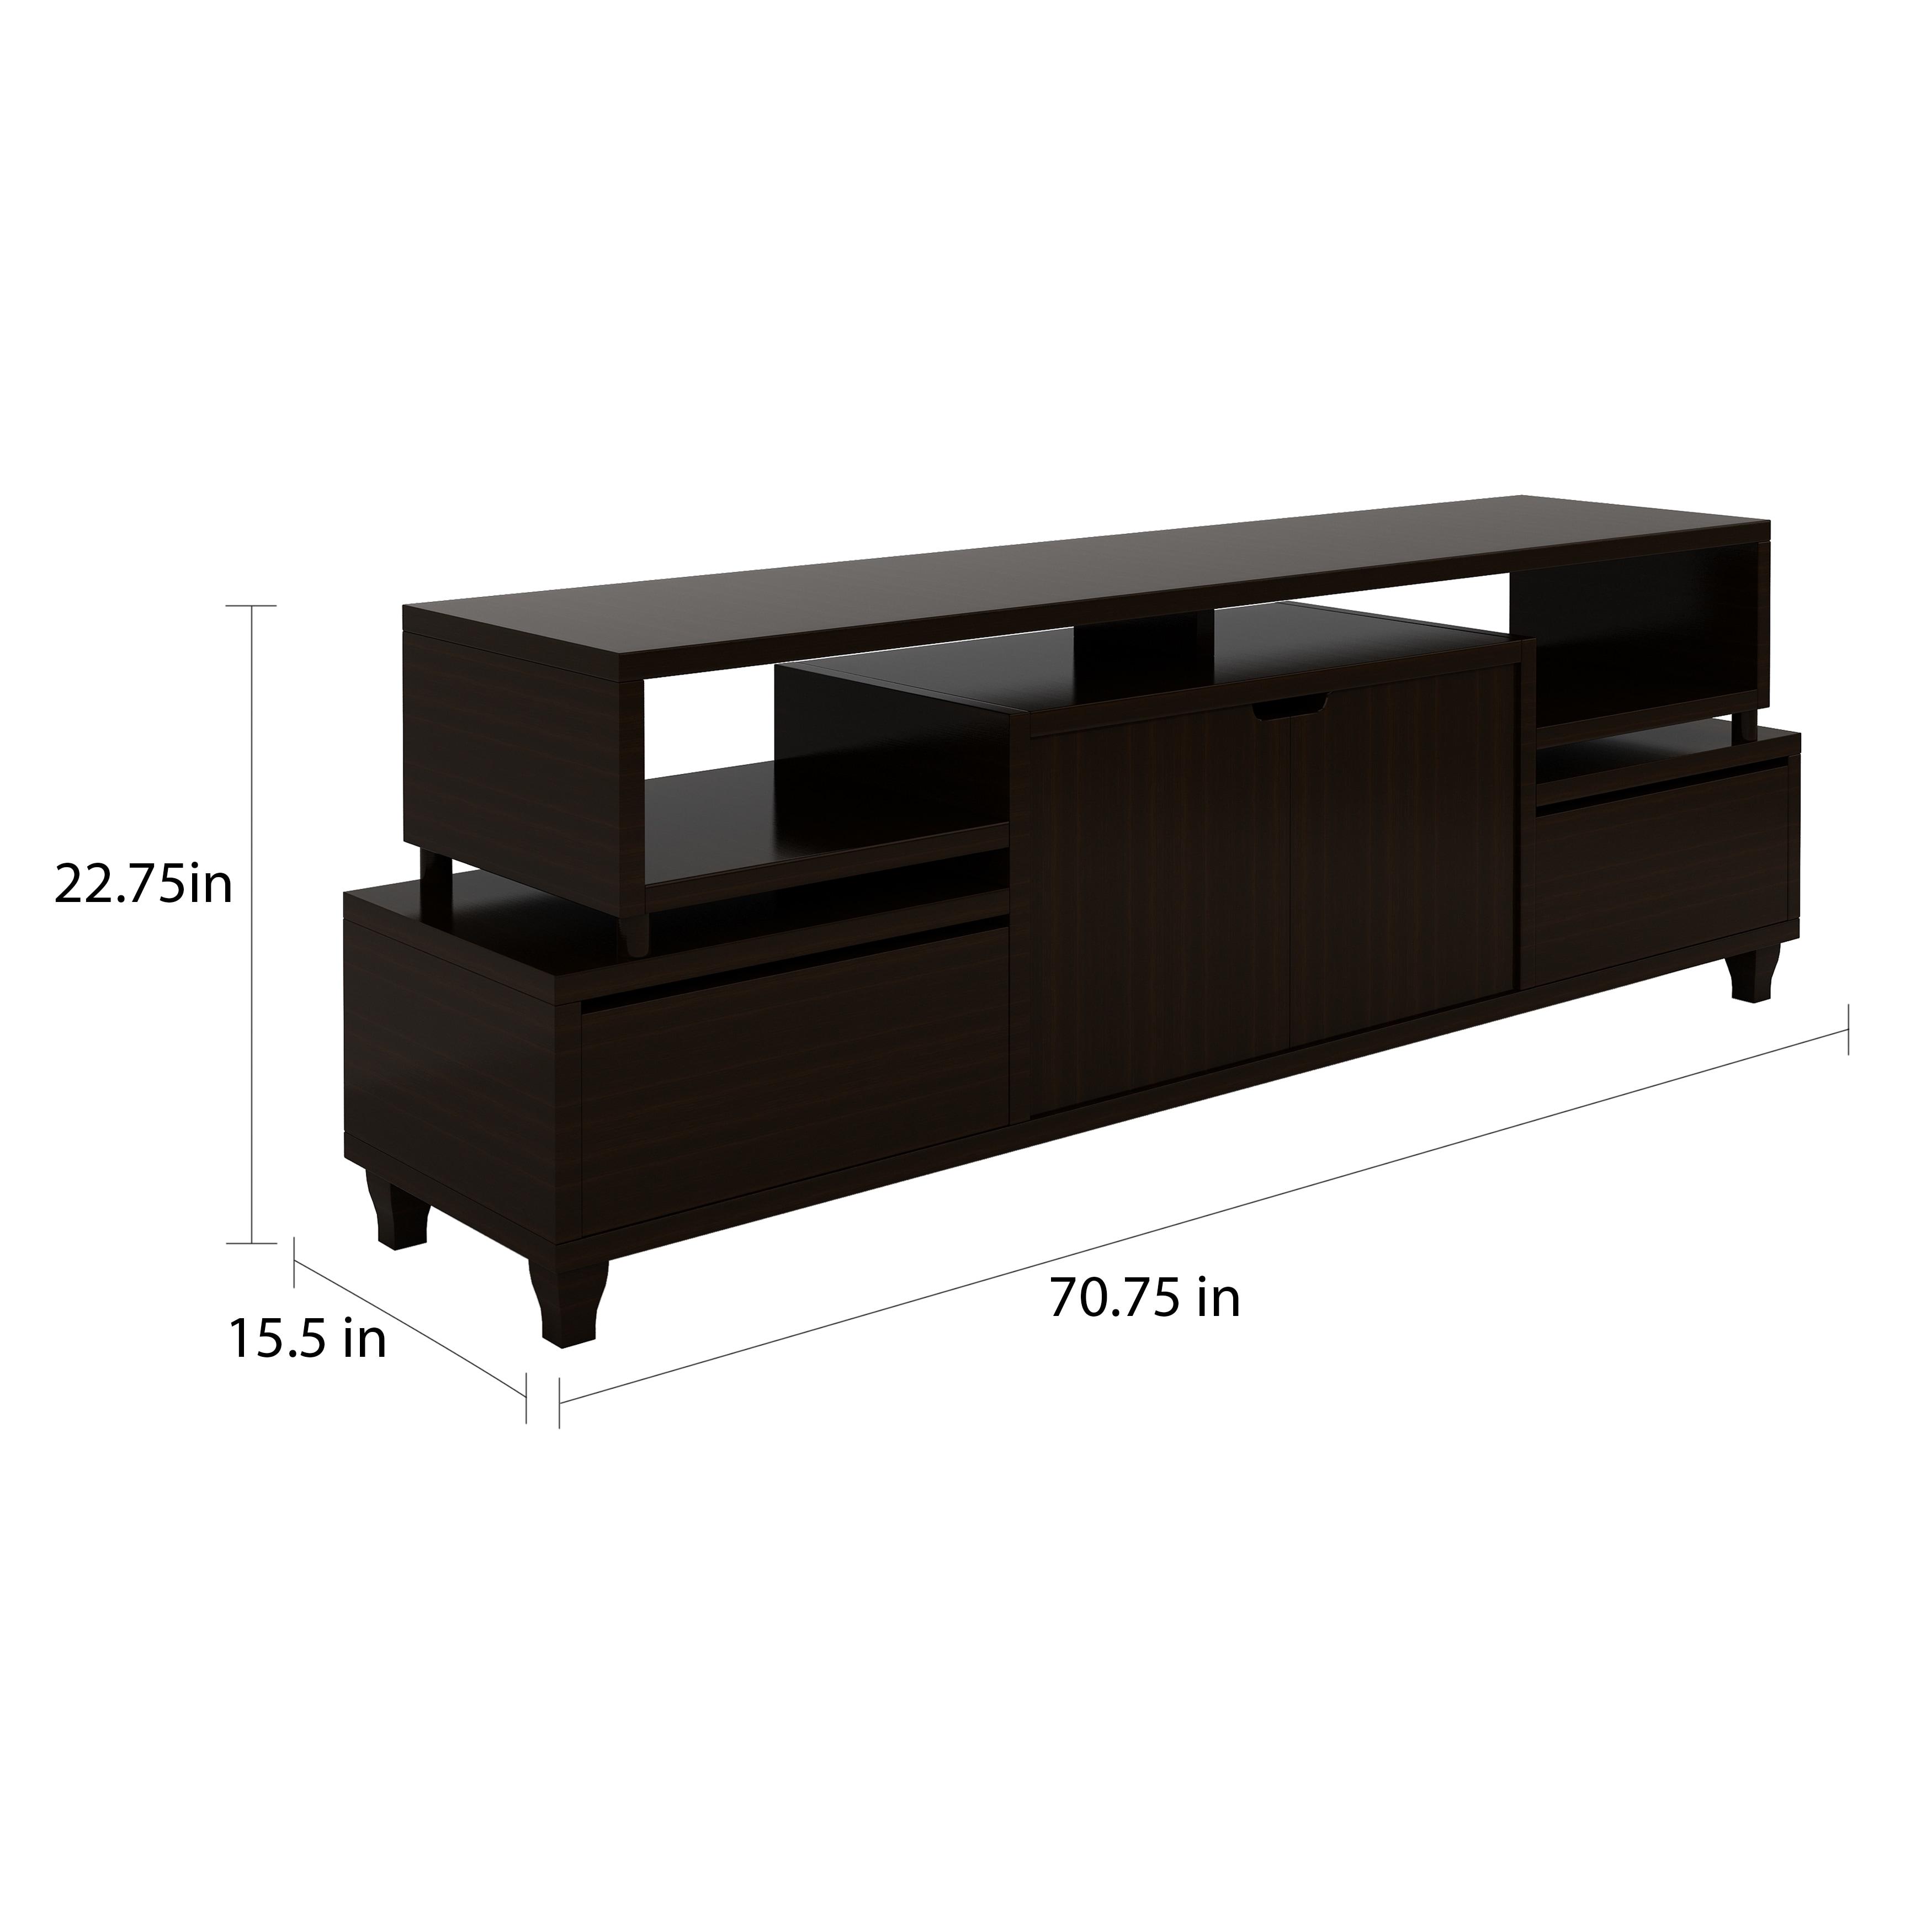 Shop Porch Den Brickell Tiered Storage Cappuccino 70 Inch Tv Stand